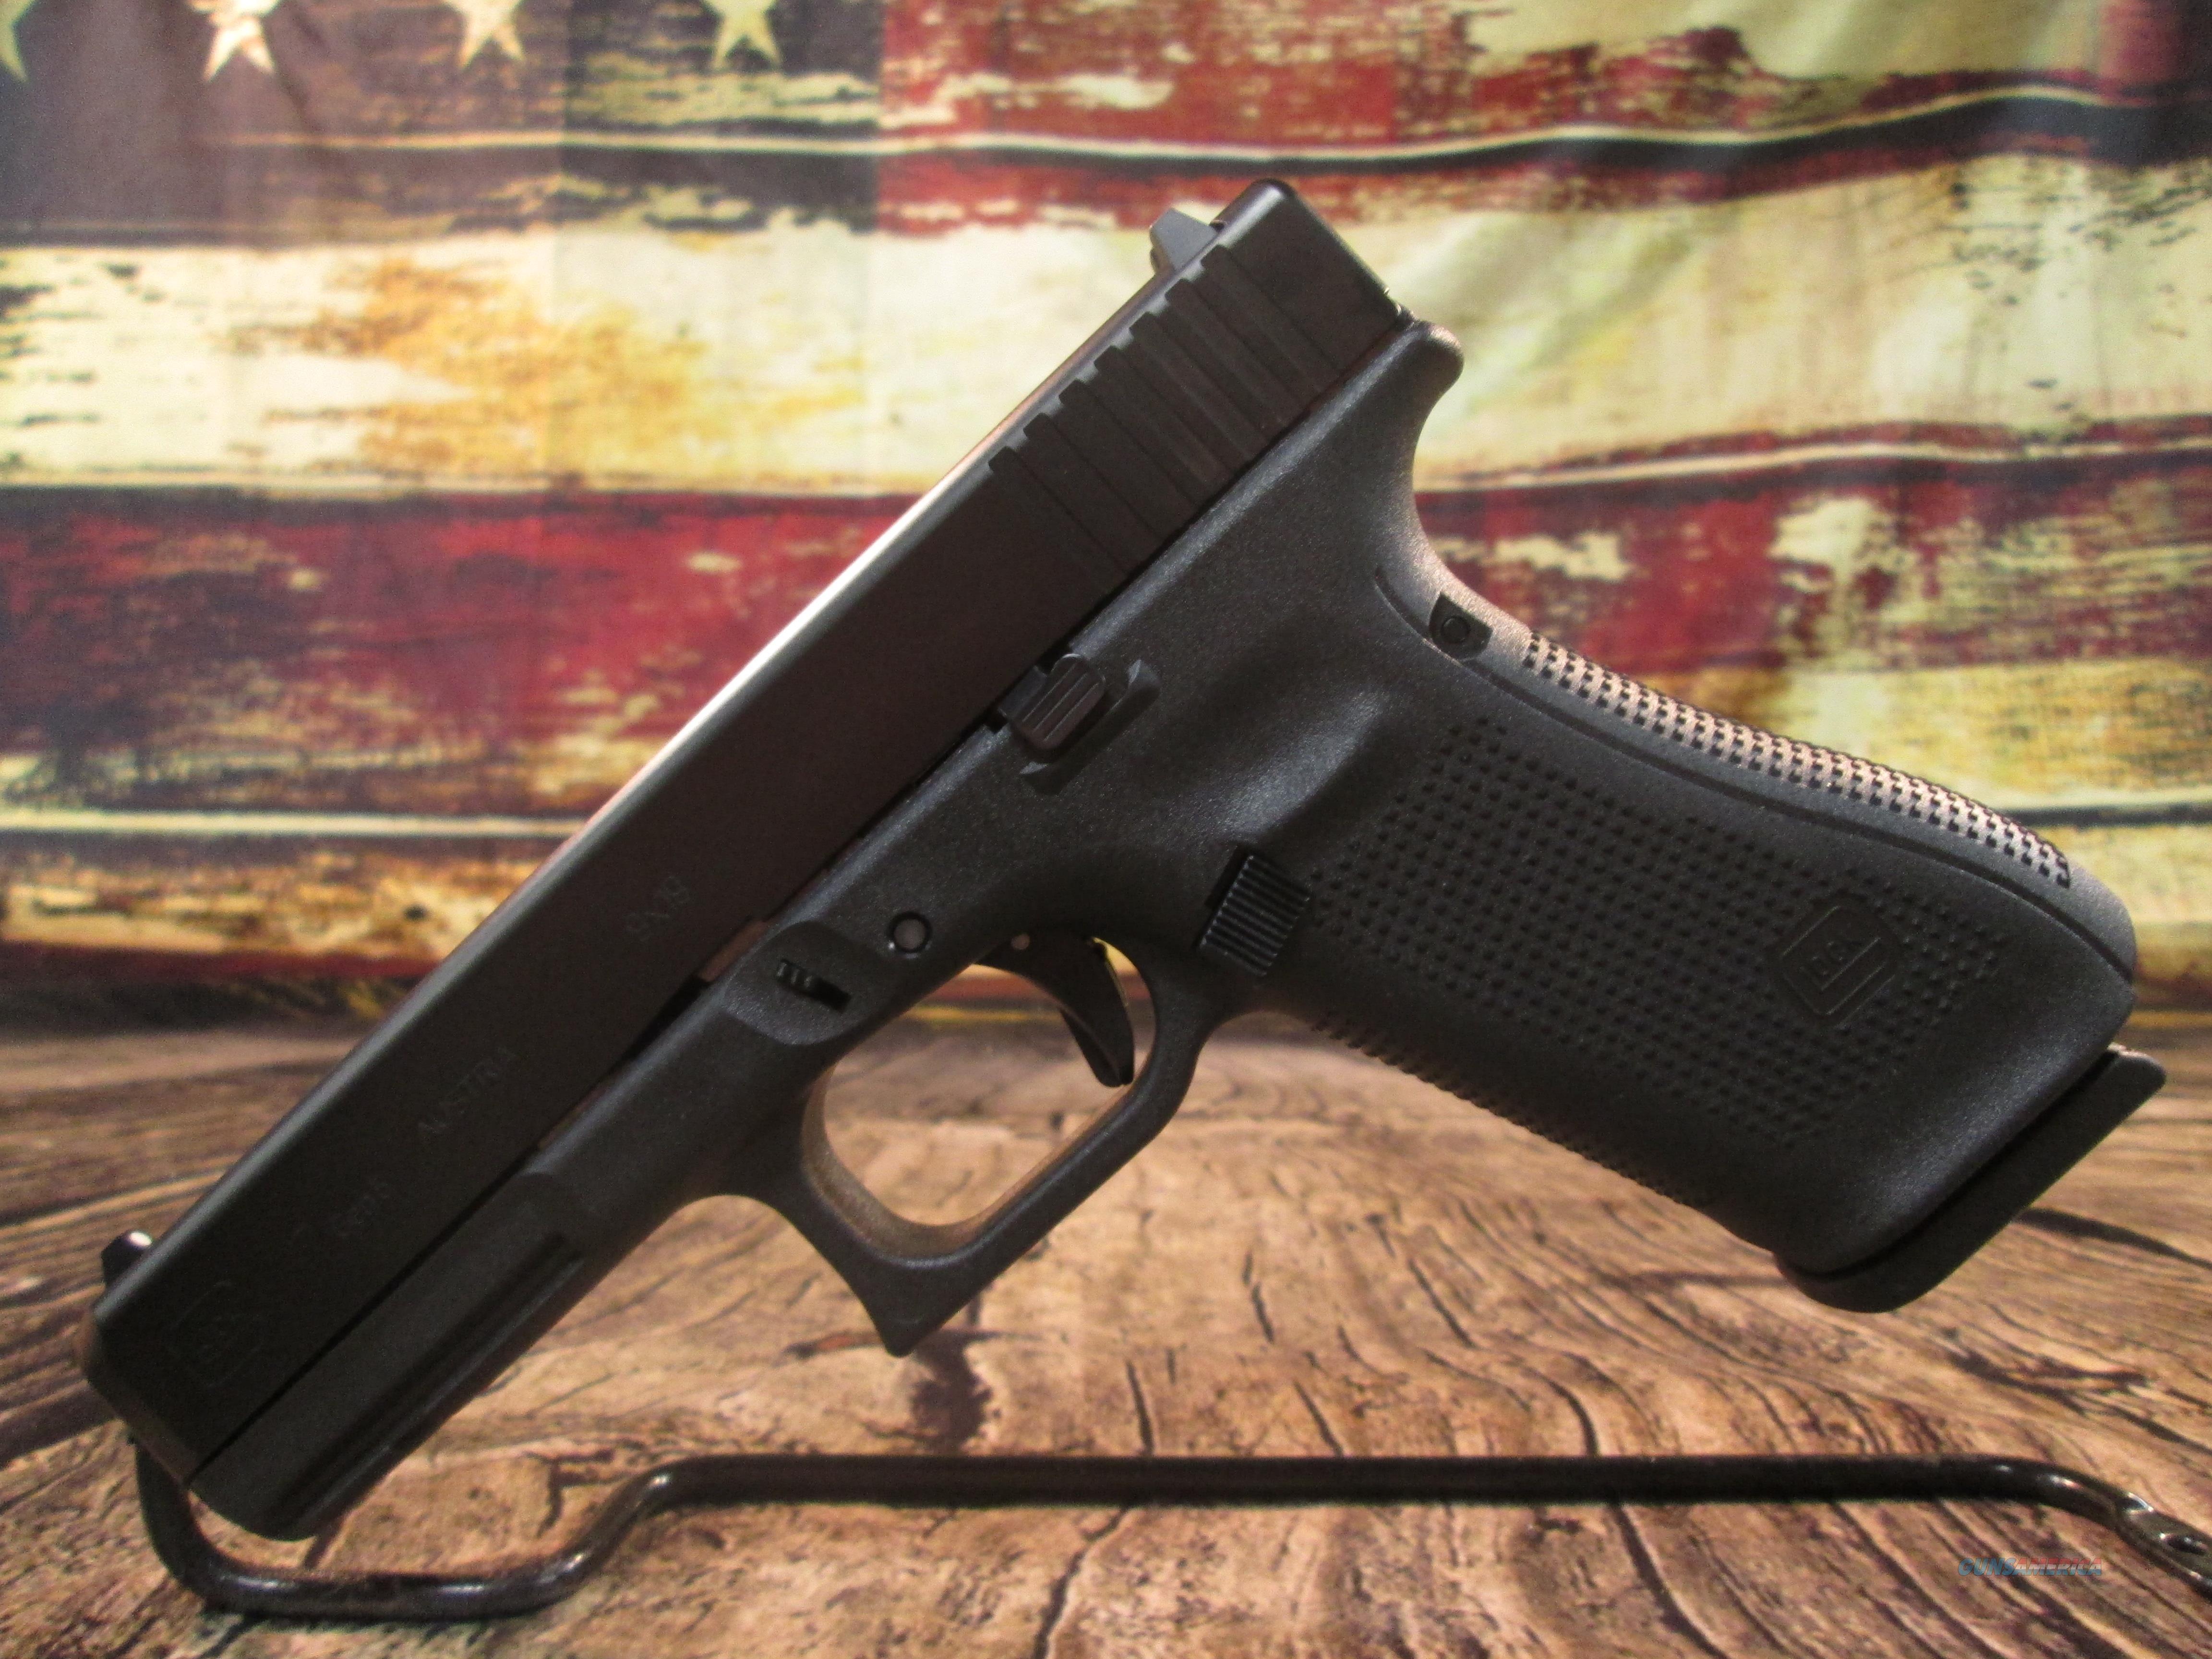 GLOCK MODEL 17 GEN 5 NEW (PA1750203)  Guns > Pistols > Glock Pistols > 17